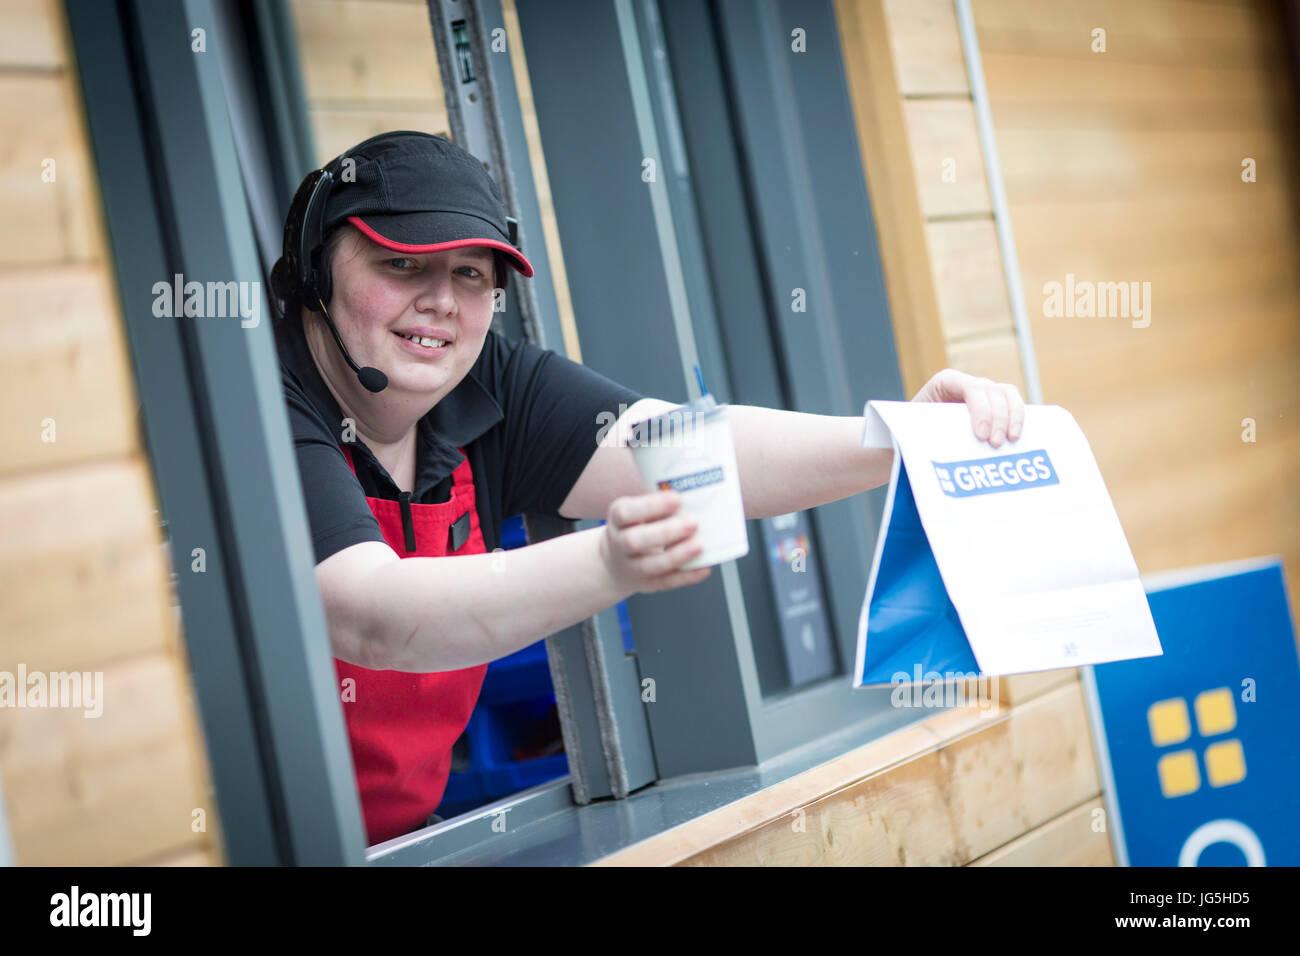 Greggs Drive Thru bakery  Irlam Gateway Service Station, Liverpool Rd, Irlam, Eccles, Manchester . - Stock Image